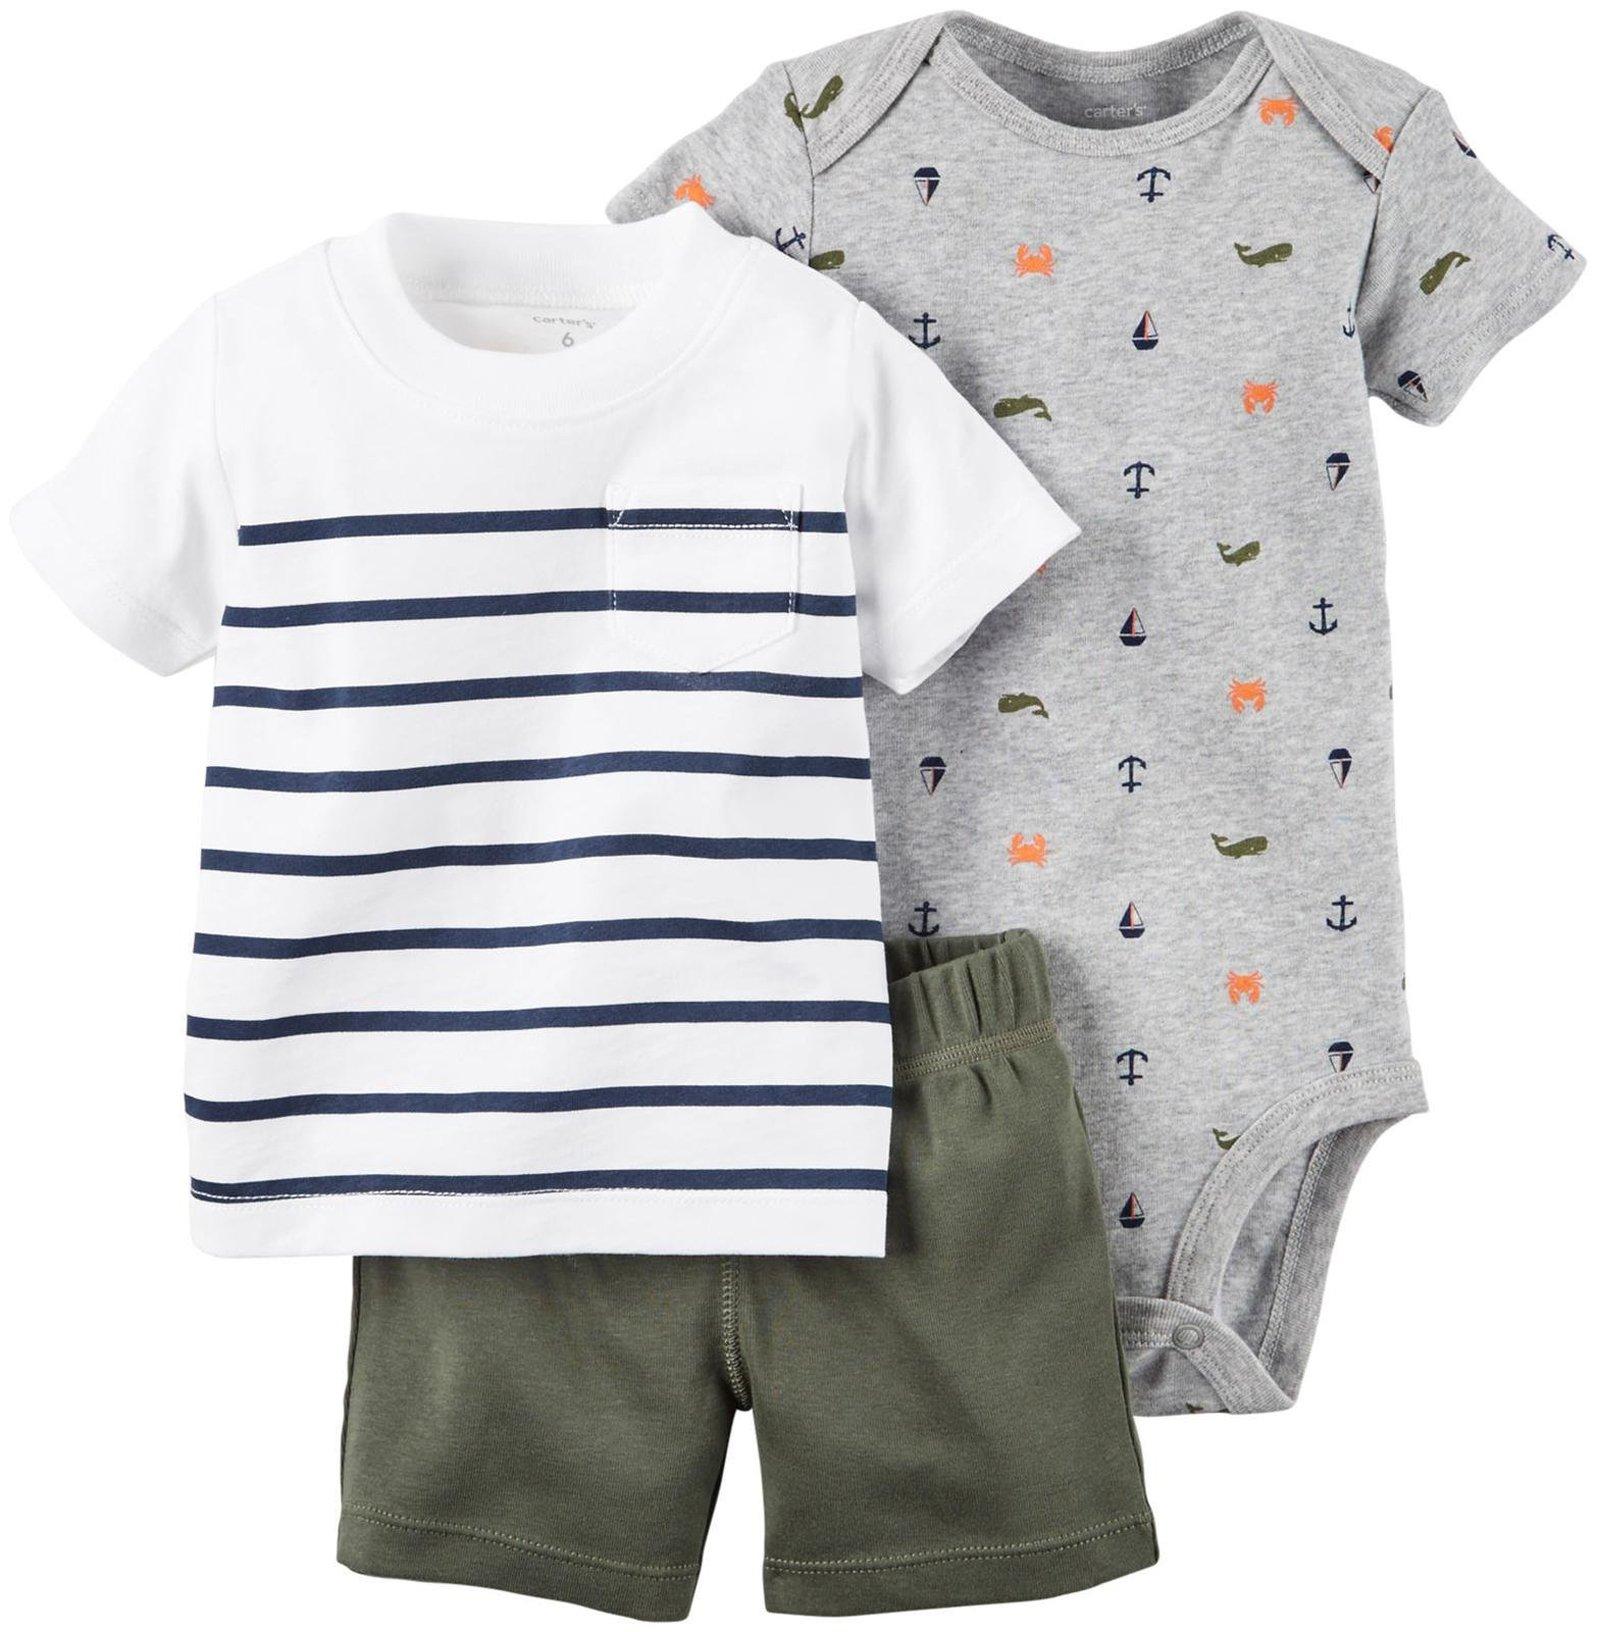 Carter's Baby Boys' Diaper Cover Set Stripe Tee BTM, Olive, 6 Months